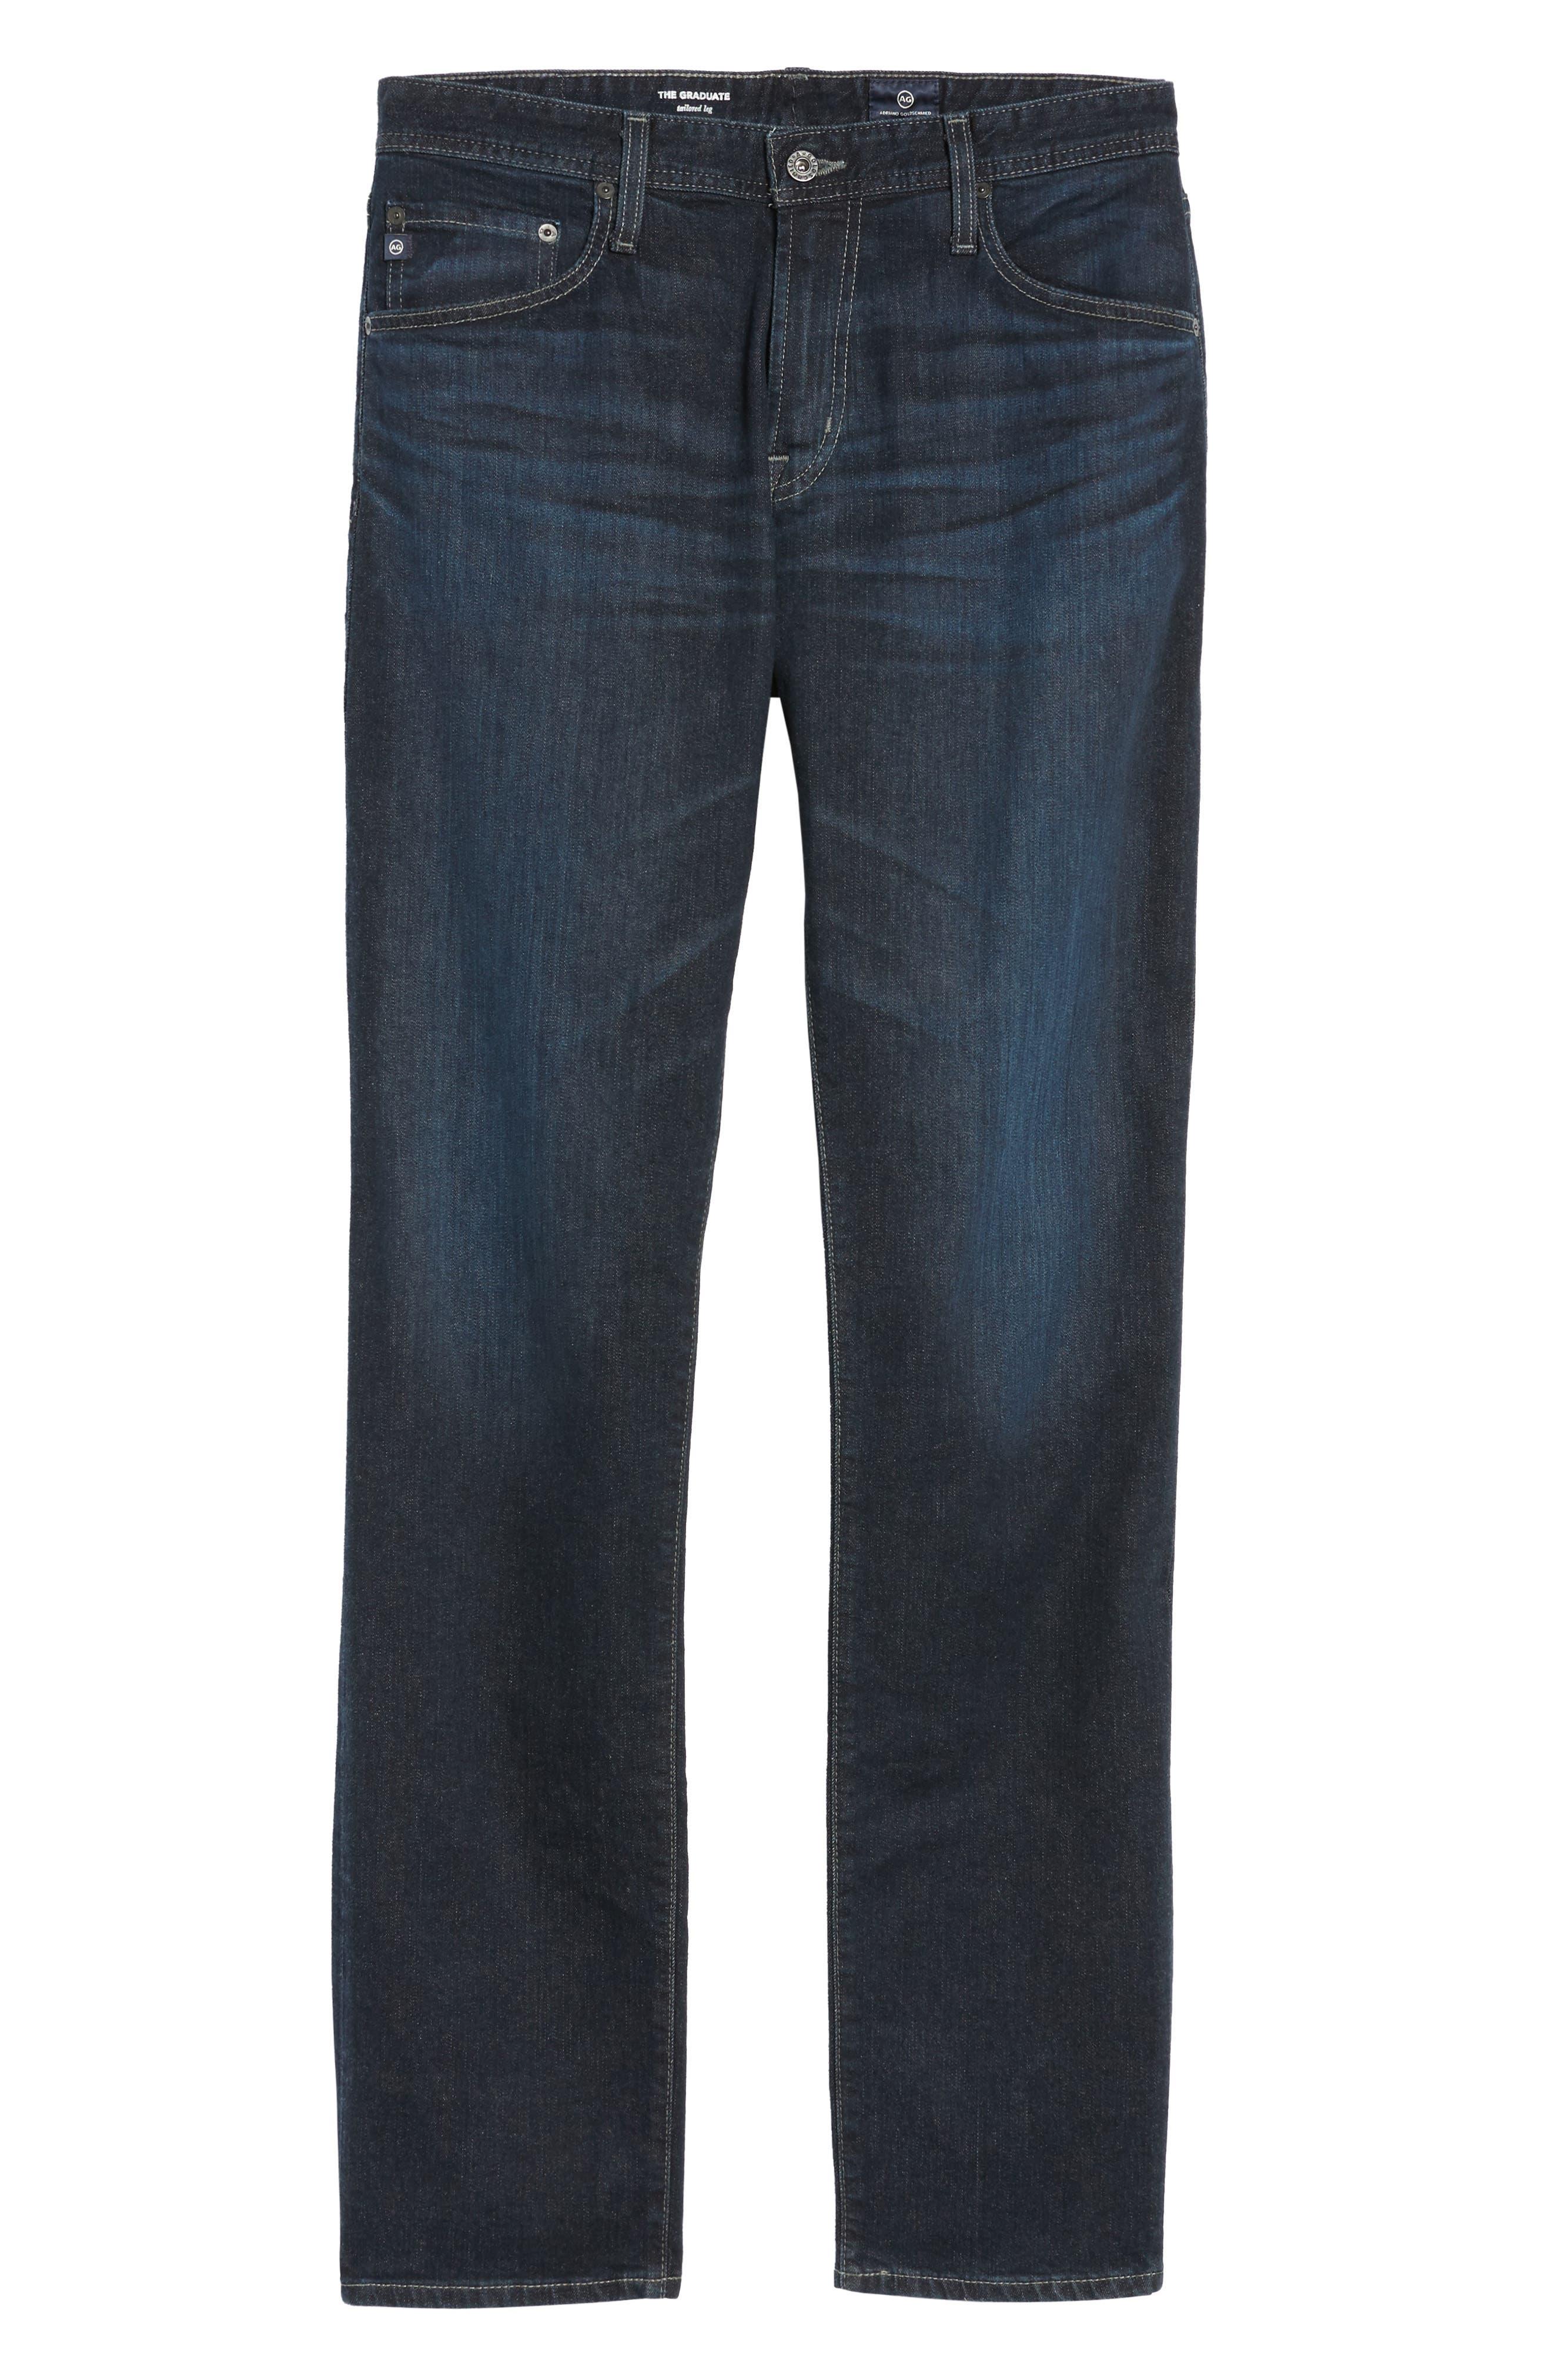 Graduate Slim Straight Leg Jeans,                         Main,                         color, ROCKWELL